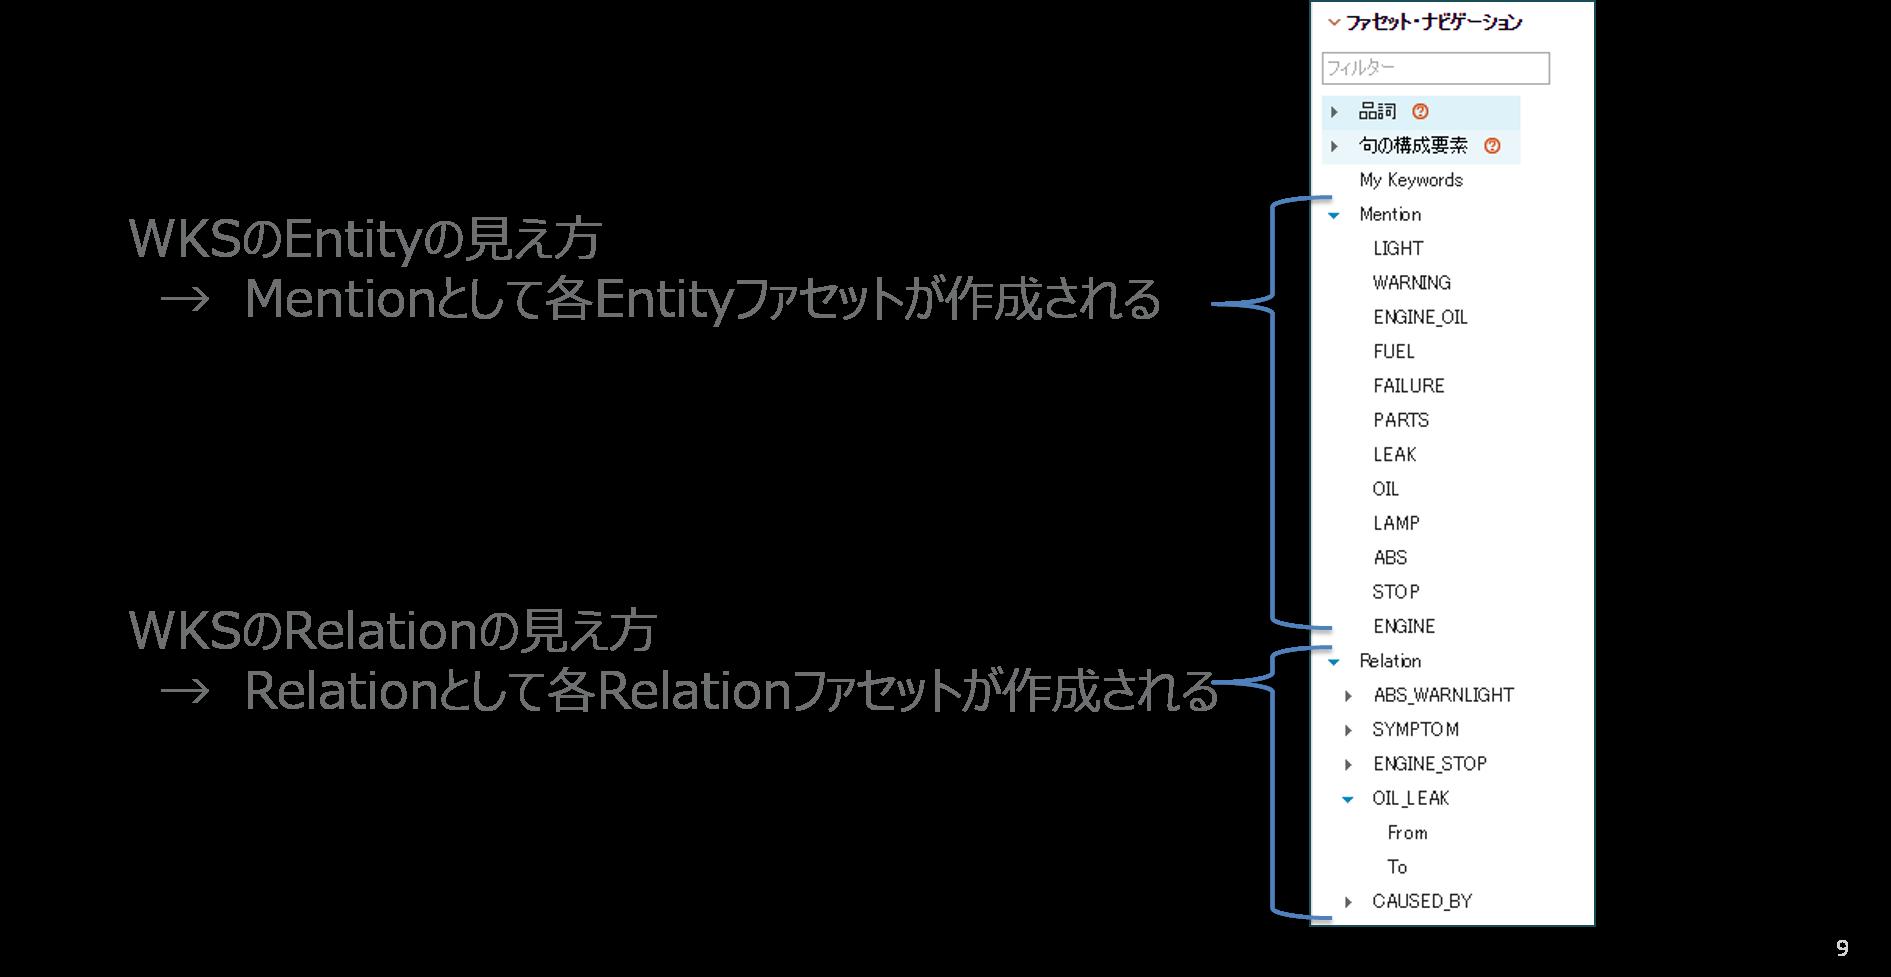 06.WKSのEntity,Relationの見え方.png